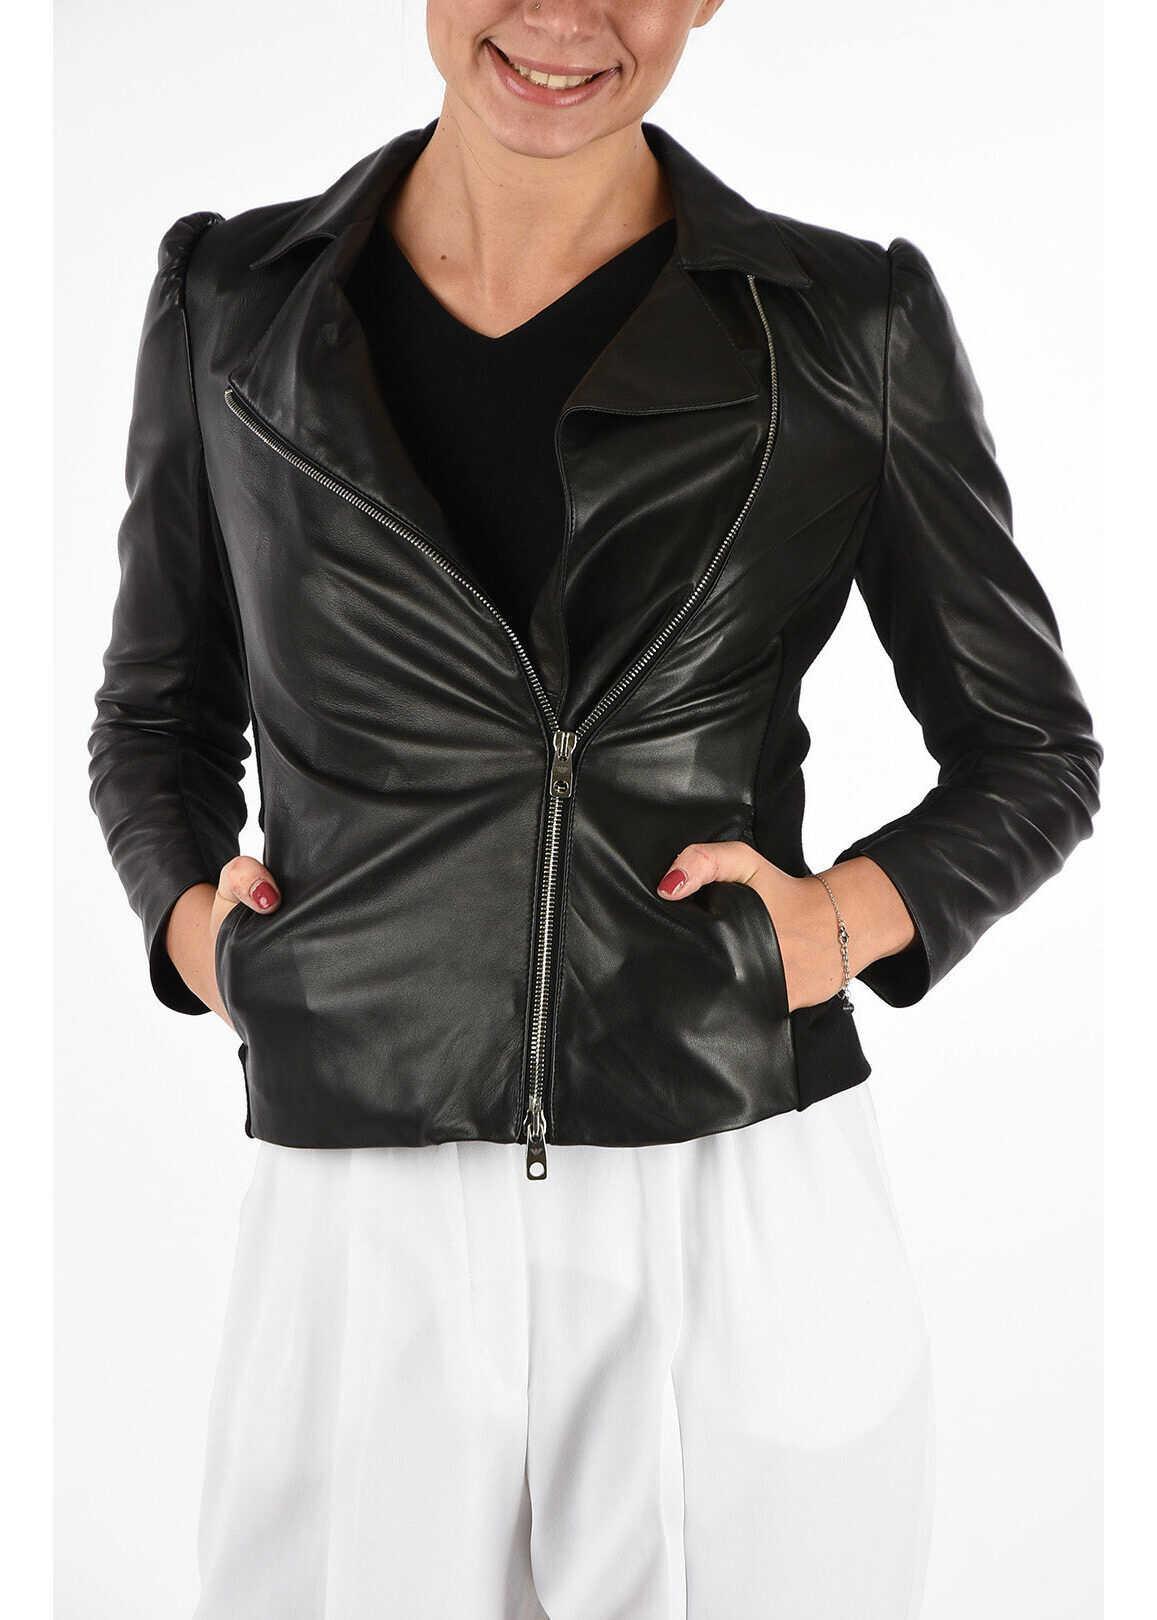 Armani EMPORIO Leather Jacket BLACK